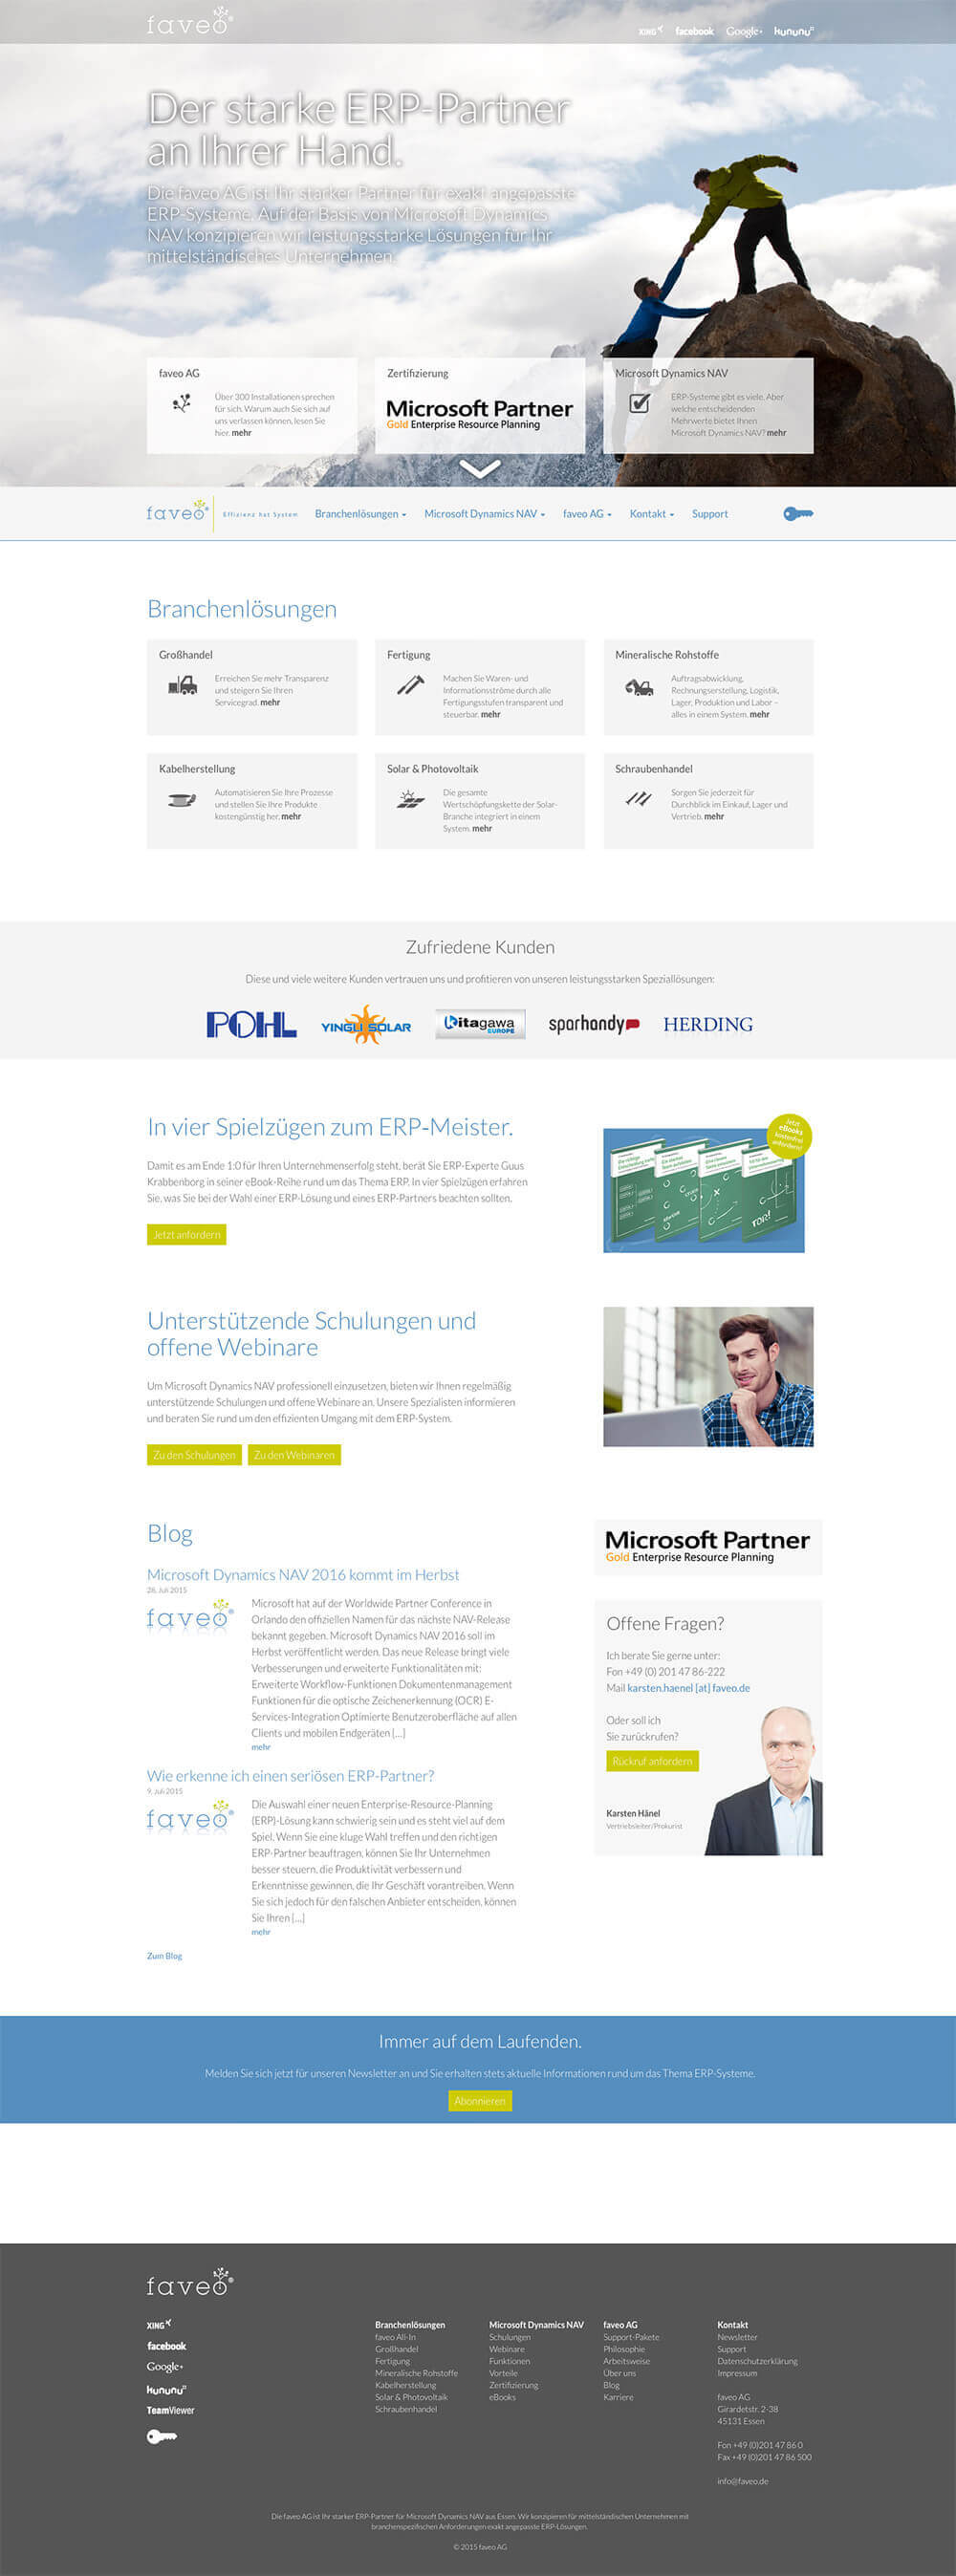 faveo Webdesign